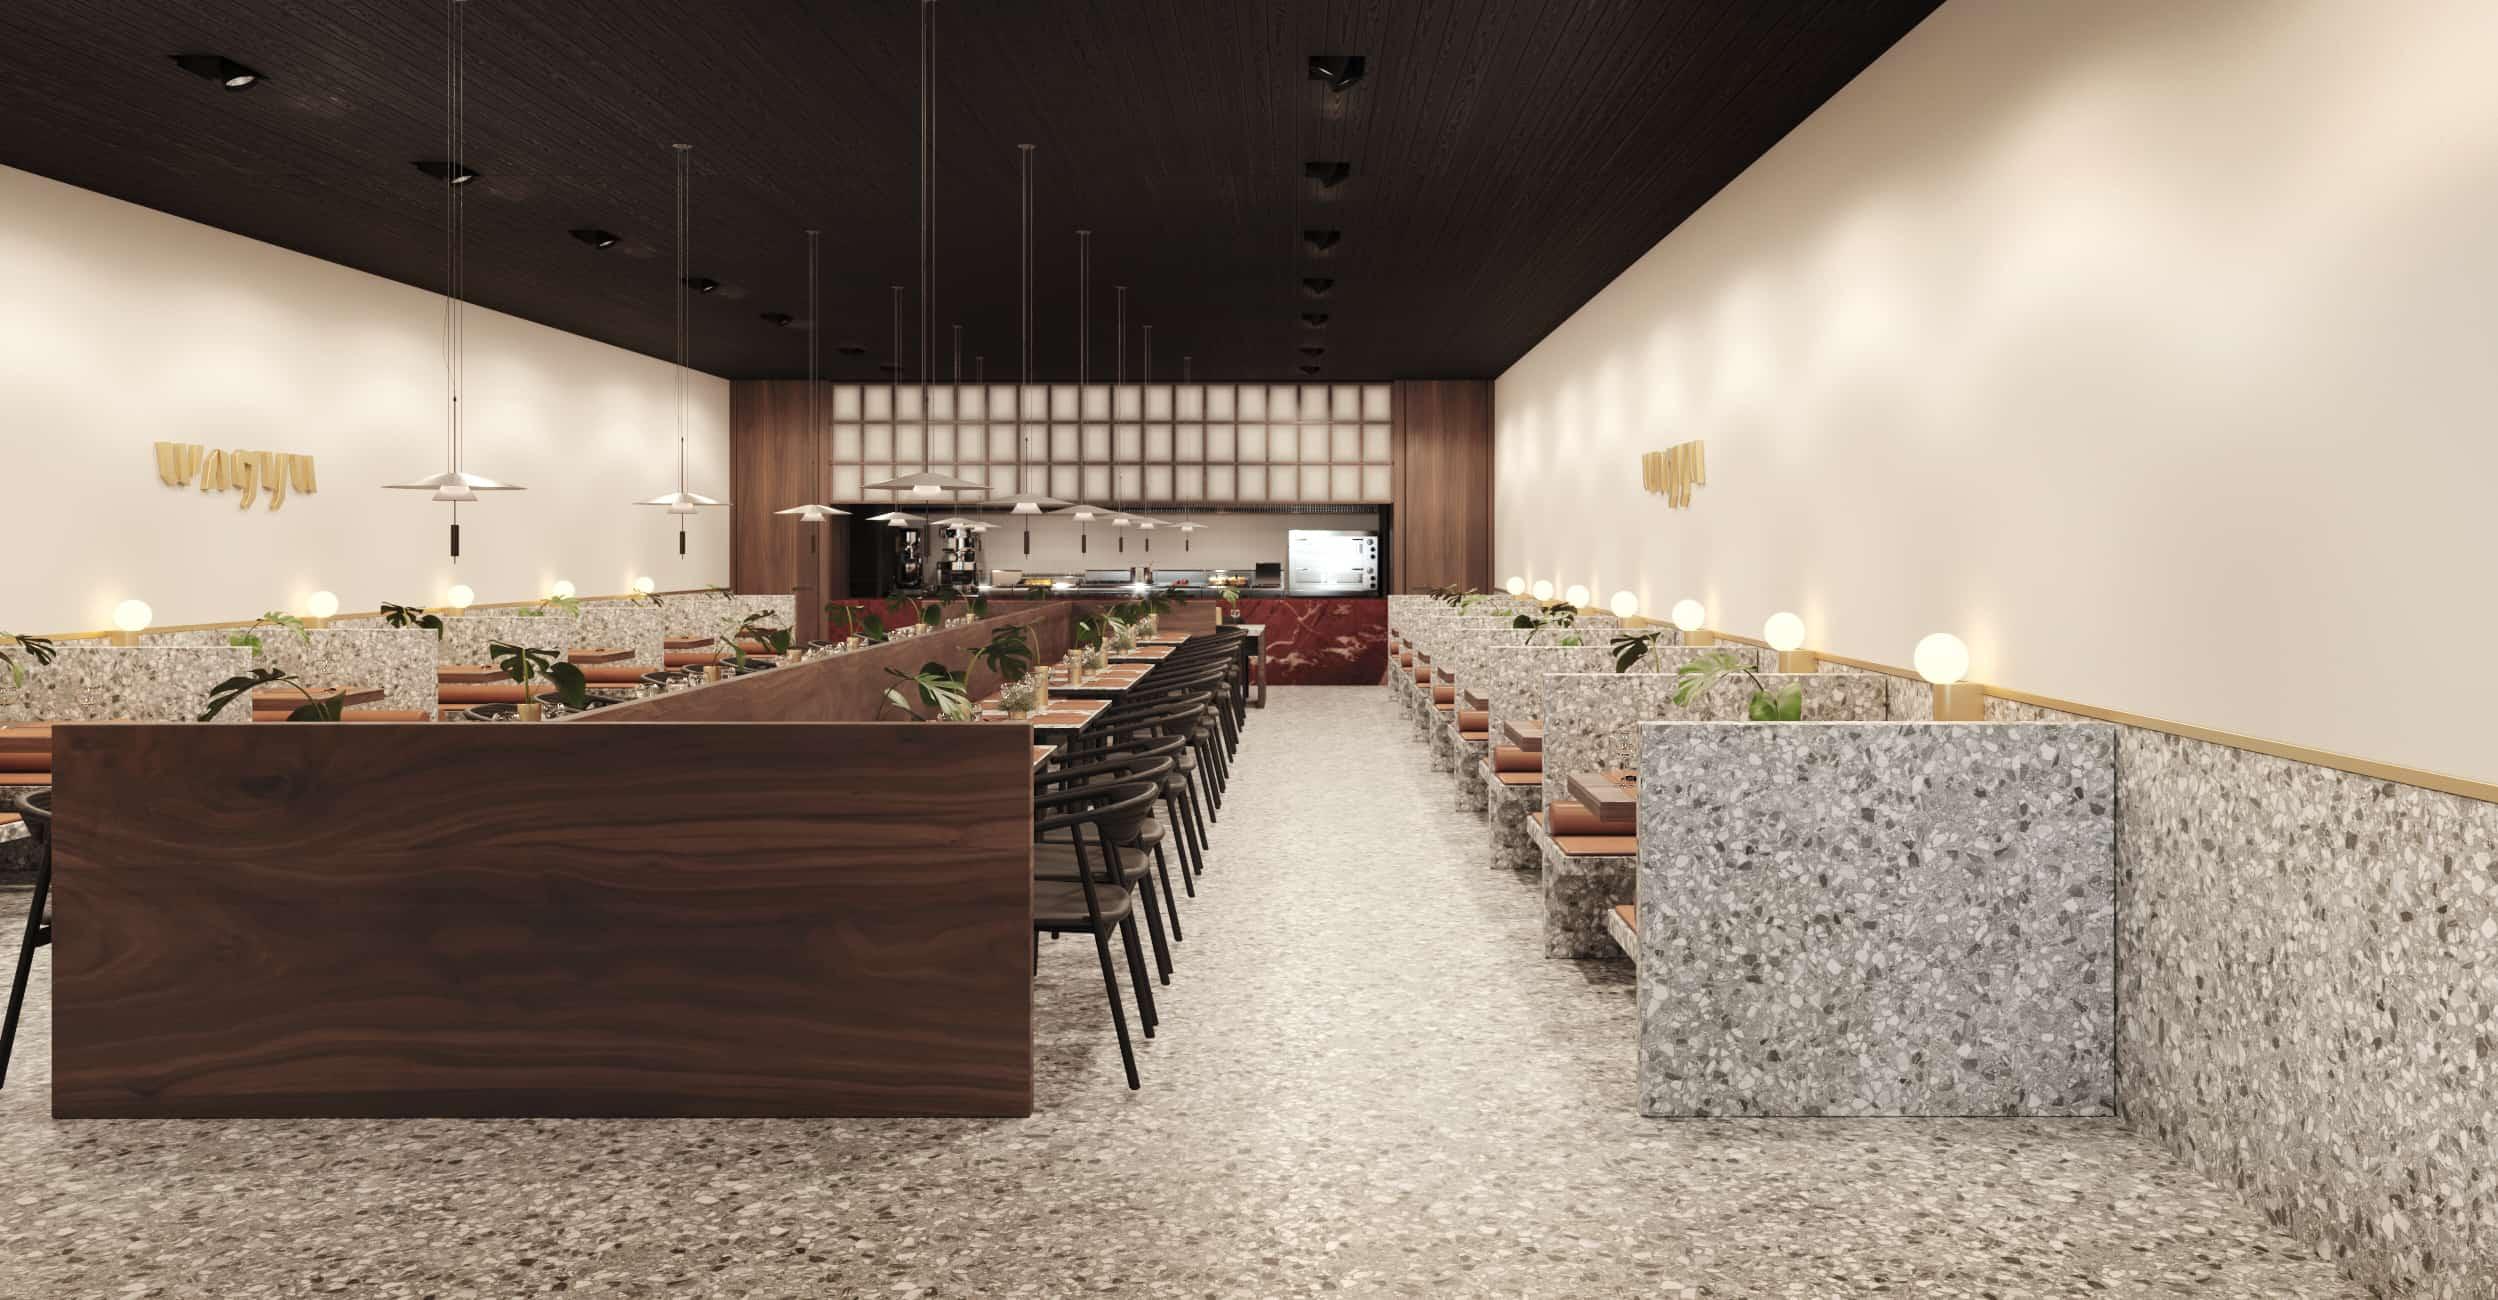 Restaurant design 11 (1)